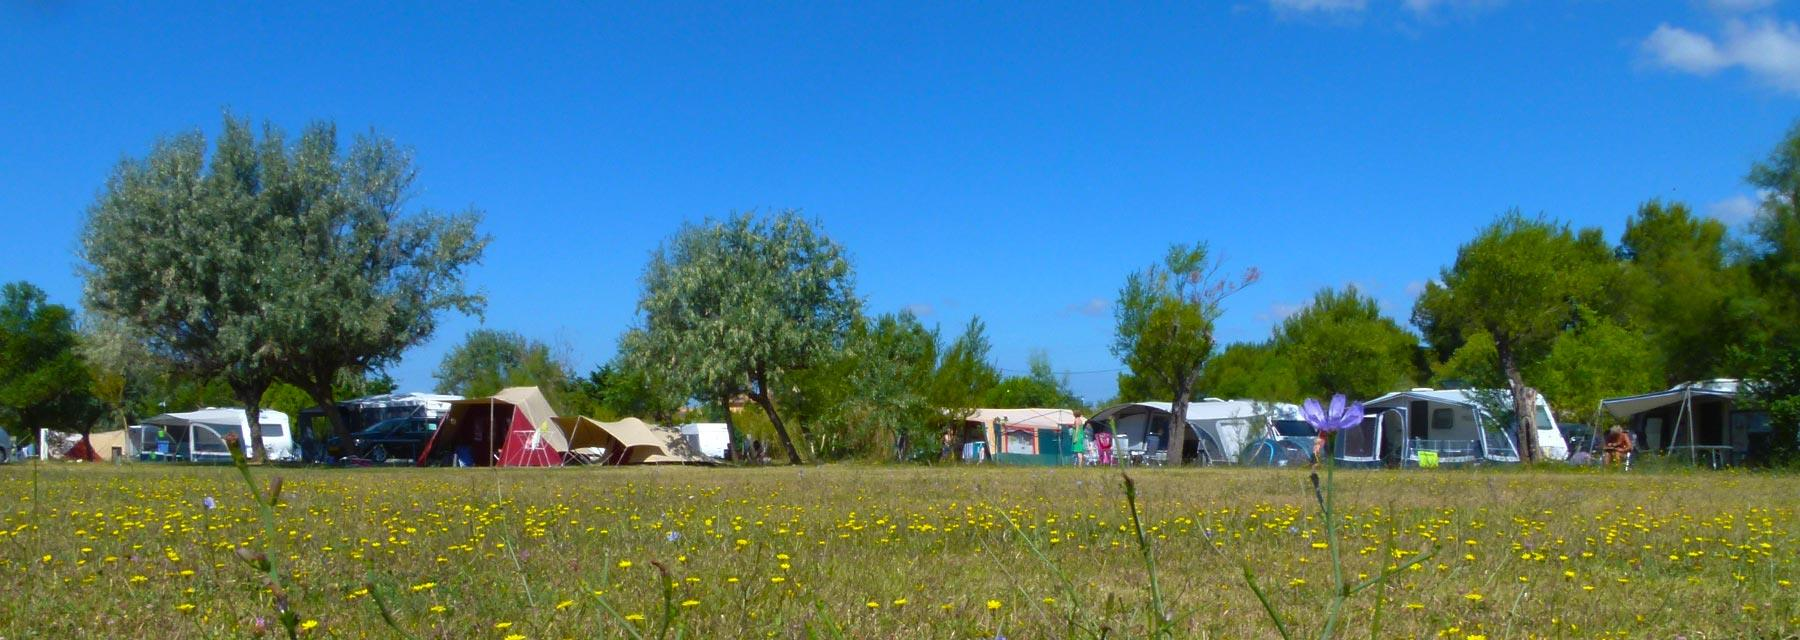 Camping Félix de la Bastide, Saint-Mitre-les-Remparts, Bouches-du-Rhône